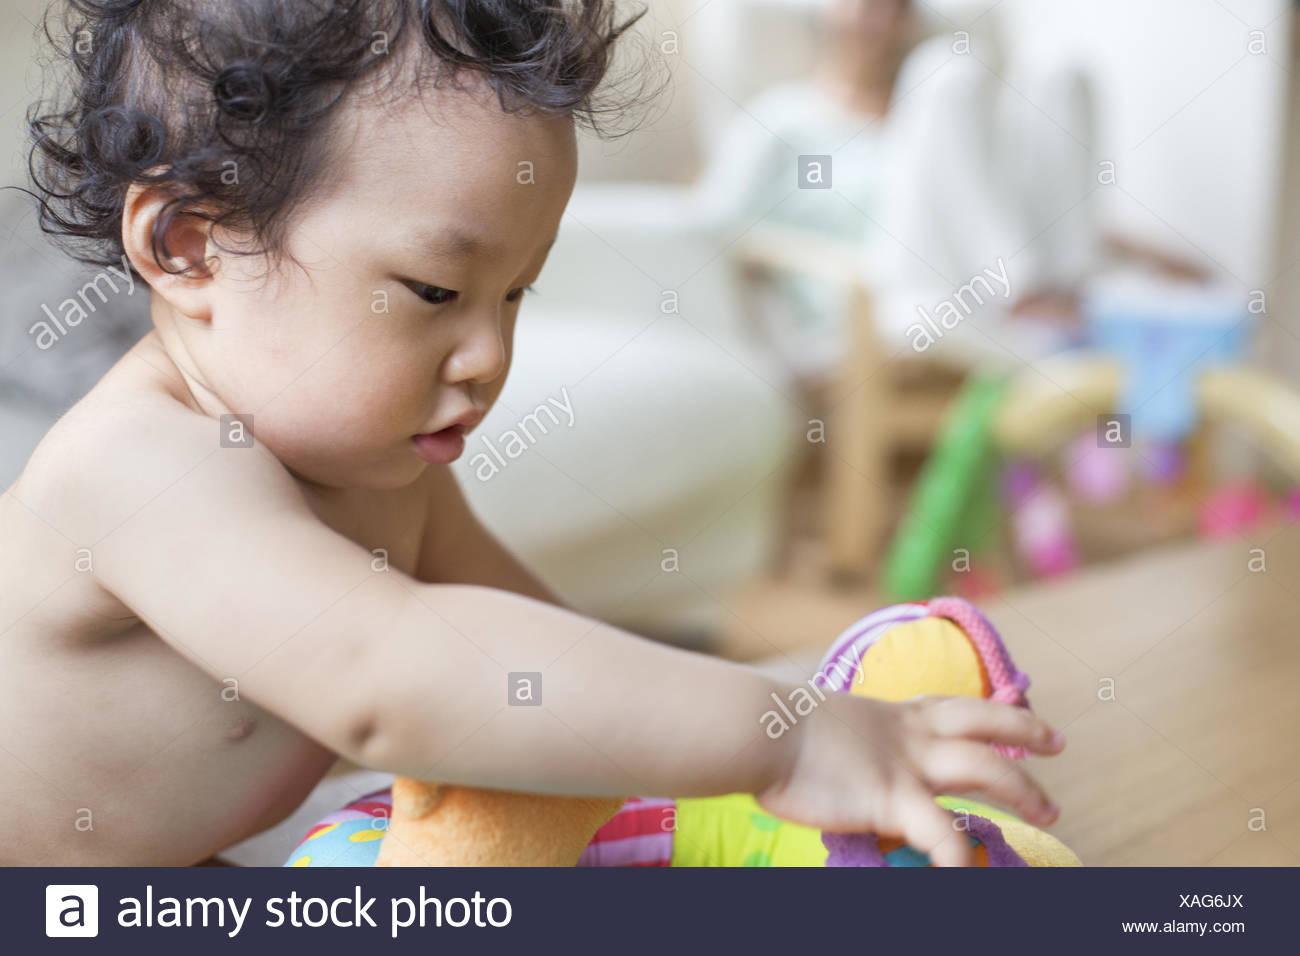 Baby boy playing indoors. - Stock Image